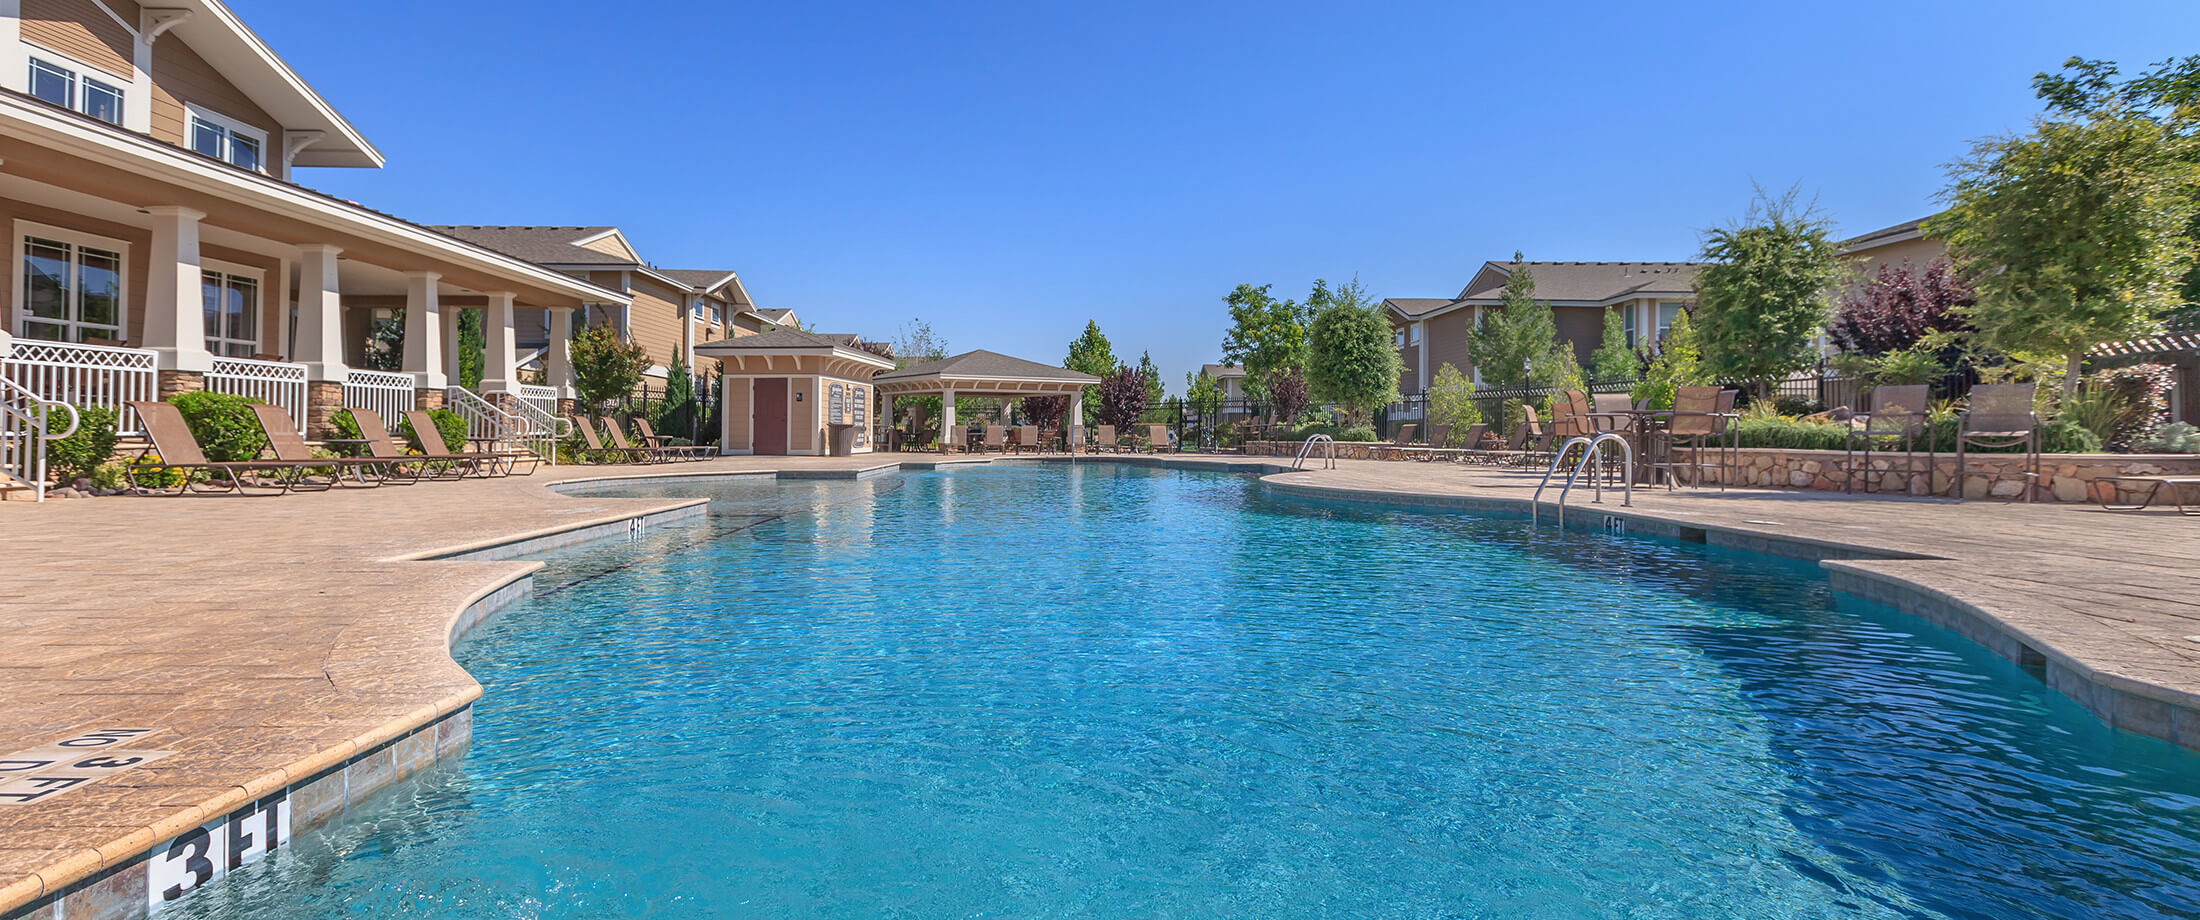 The Bungalows At Hueco Estates Apartments In El Paso Tx